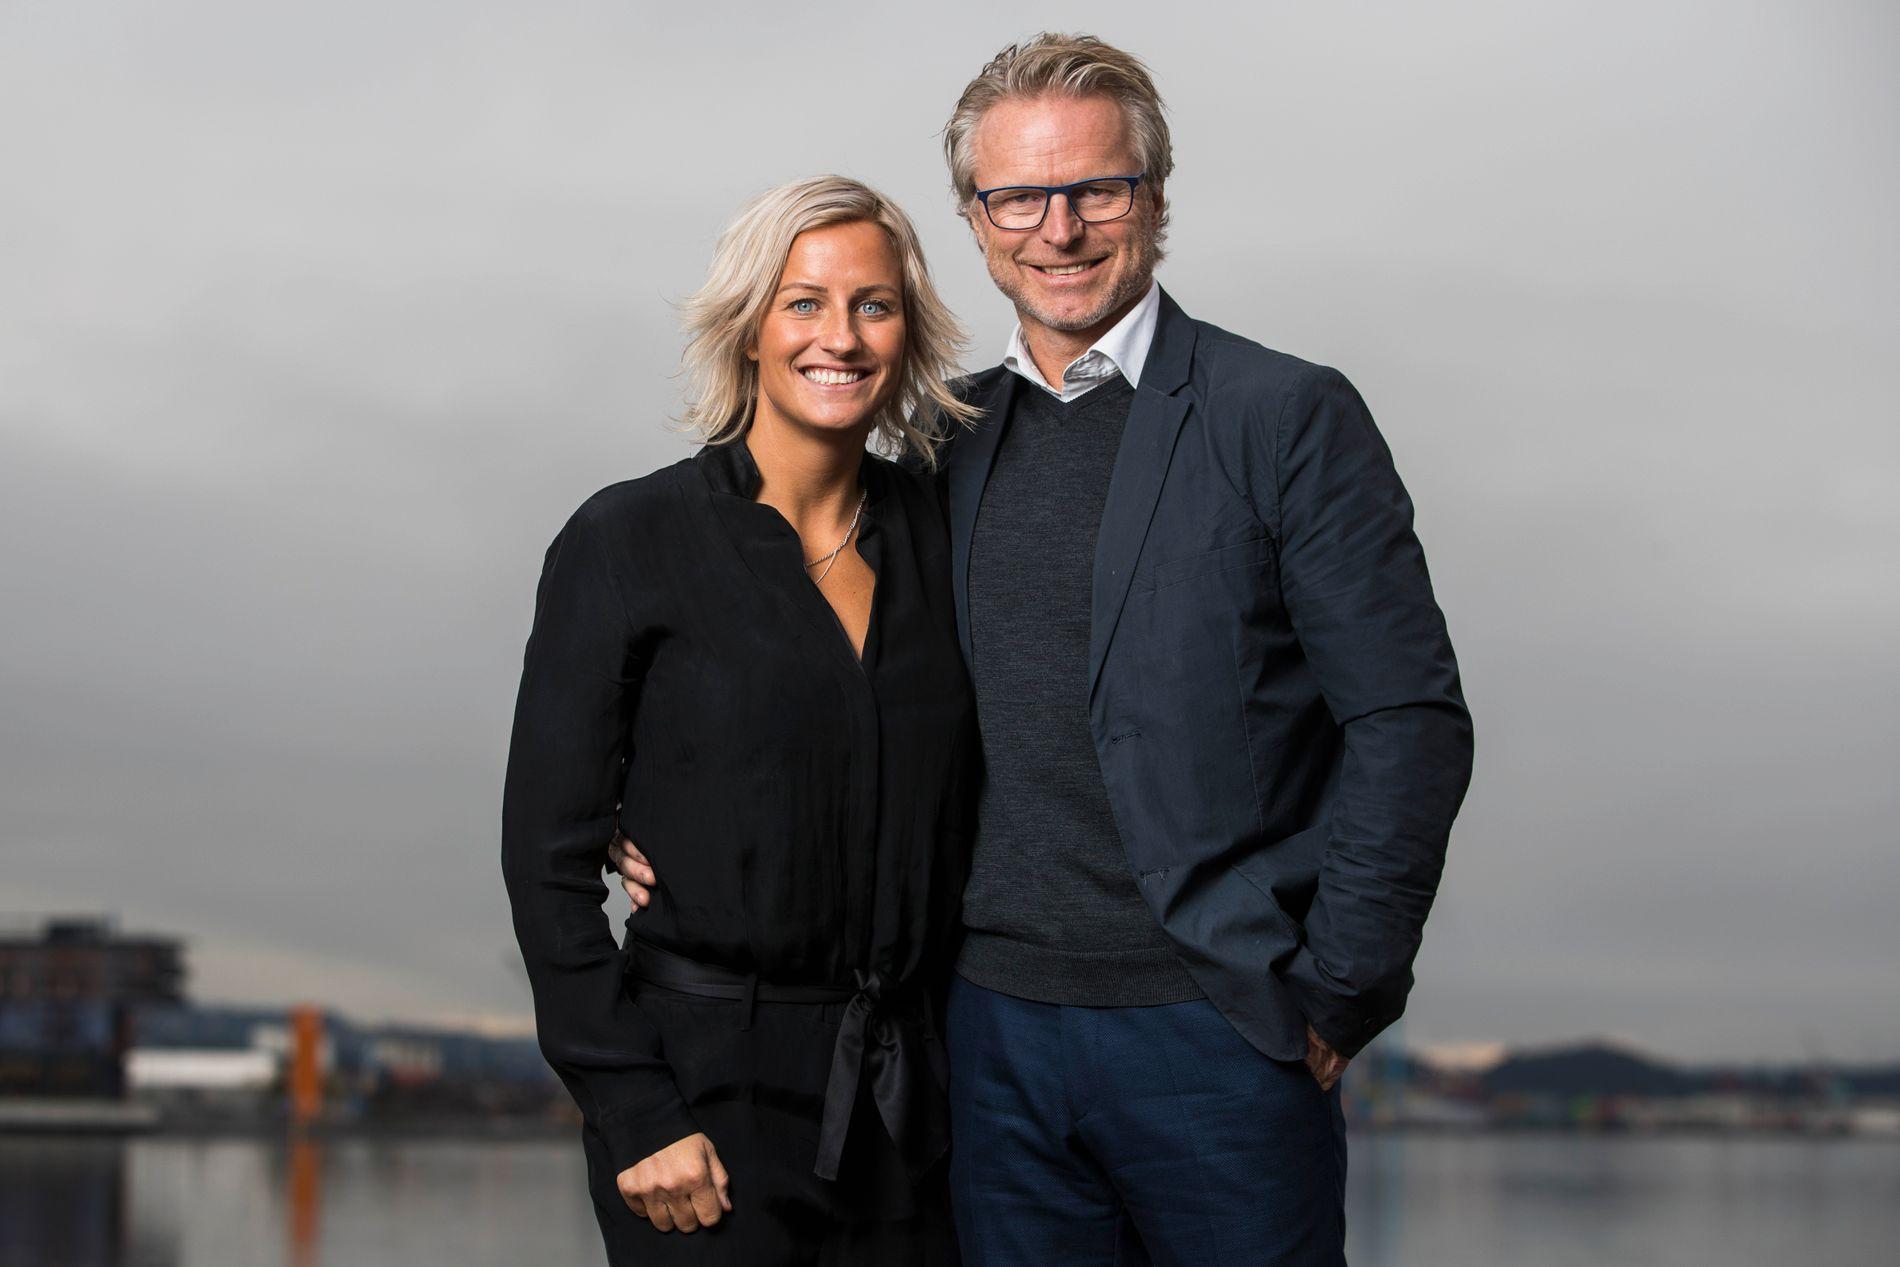 GODE KOLLEGER: Vibeke Skofterud og Åge Skinstad – her fra en lansering og markering av at det var 100 dager til OL en sen-høstdag i 2017.